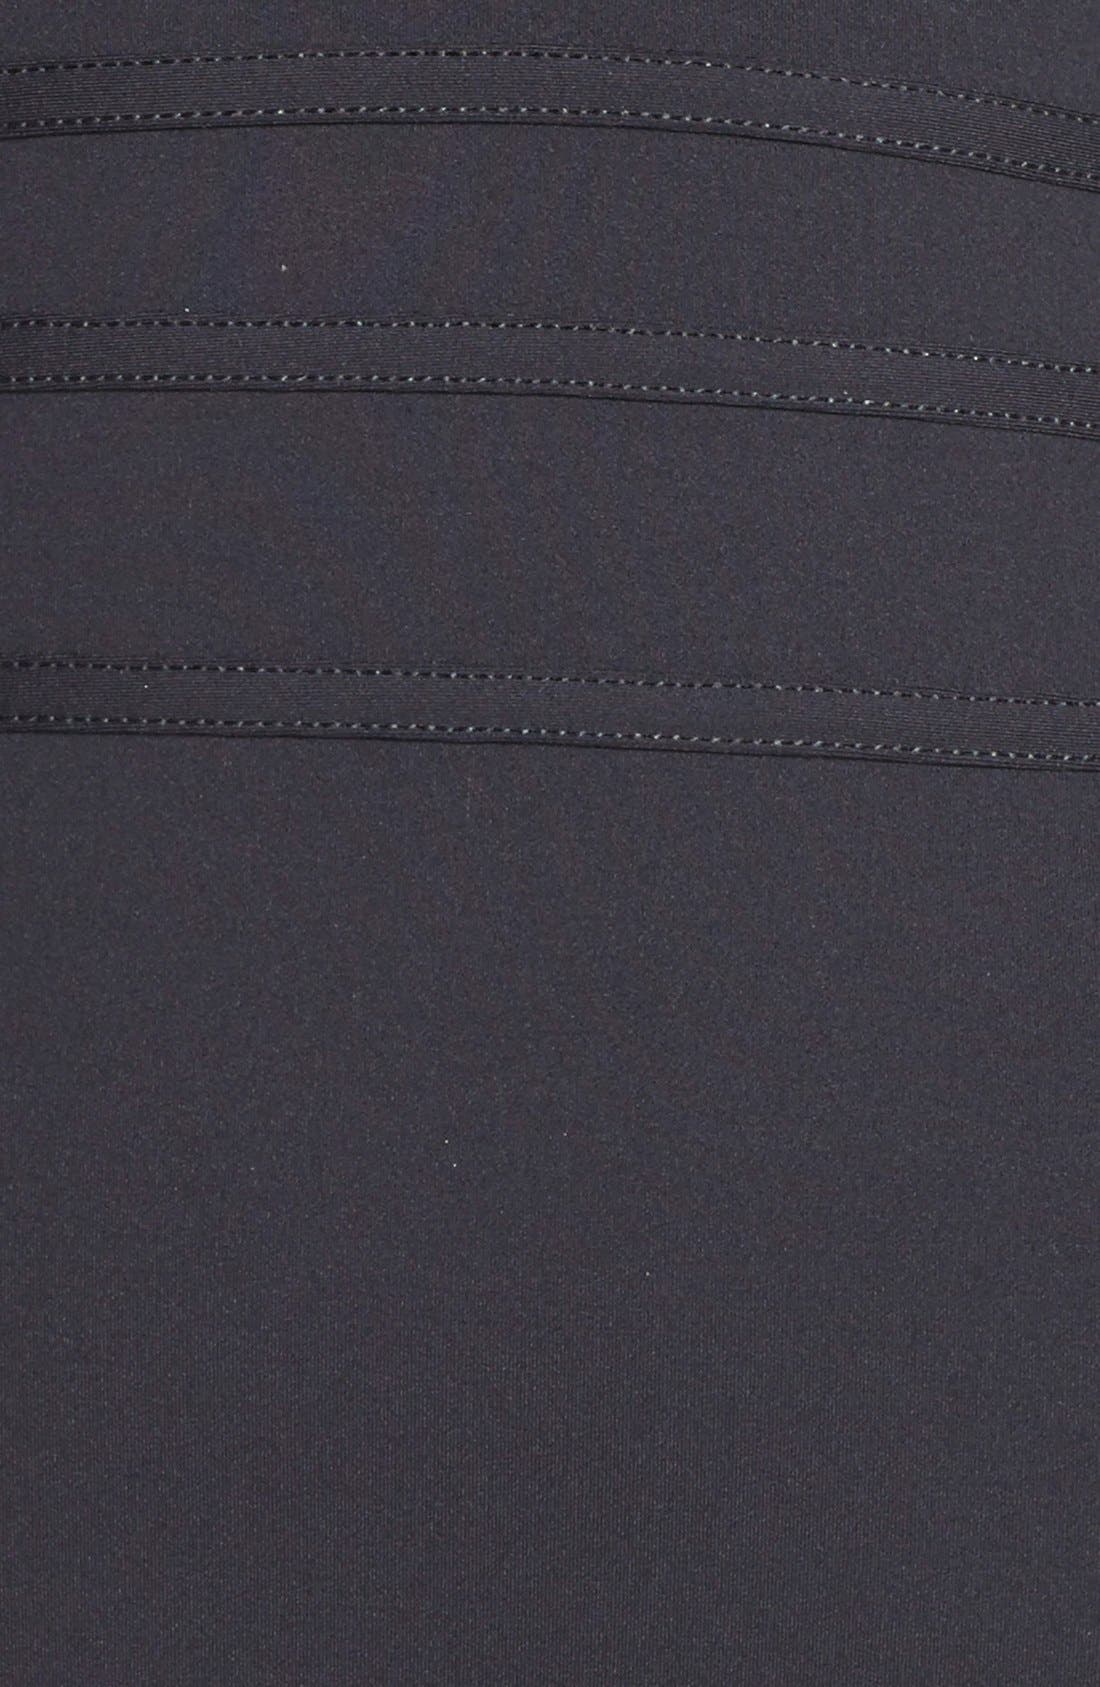 Alternate Image 3  - La Blanca 'Core' Strappy Cross Back One-Piece Swimsuit